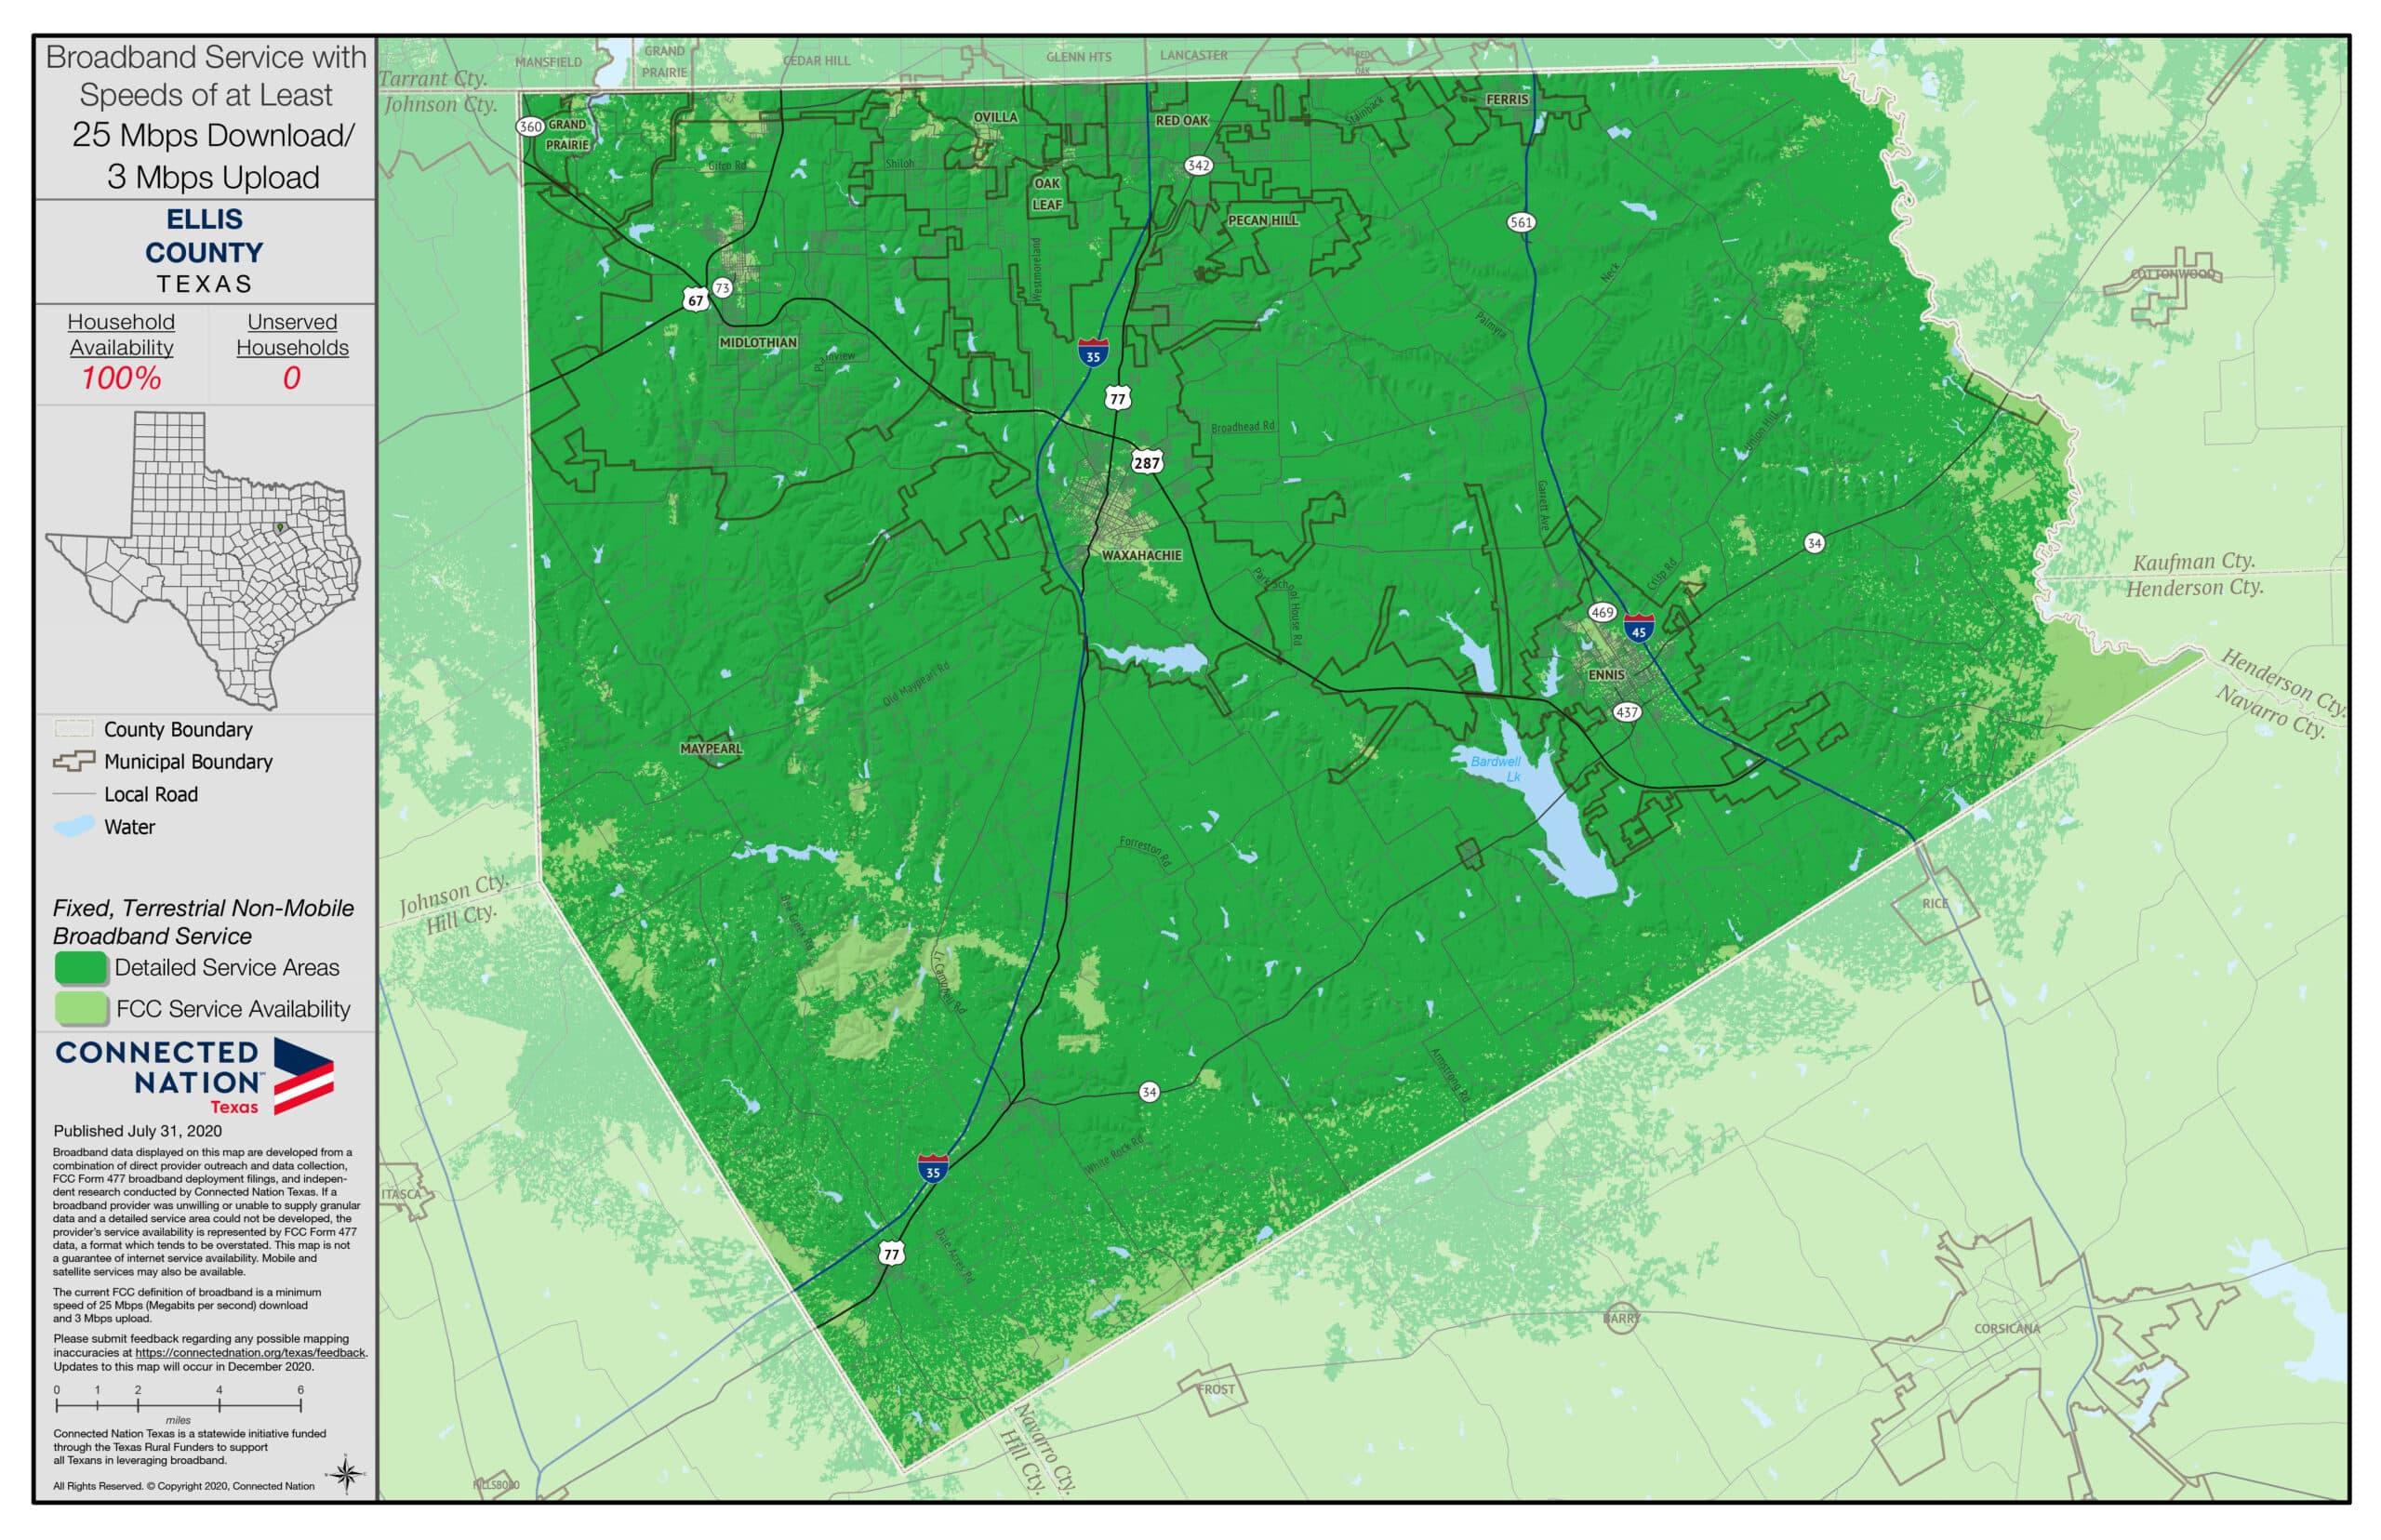 Ellis County broadband map 25 mbps